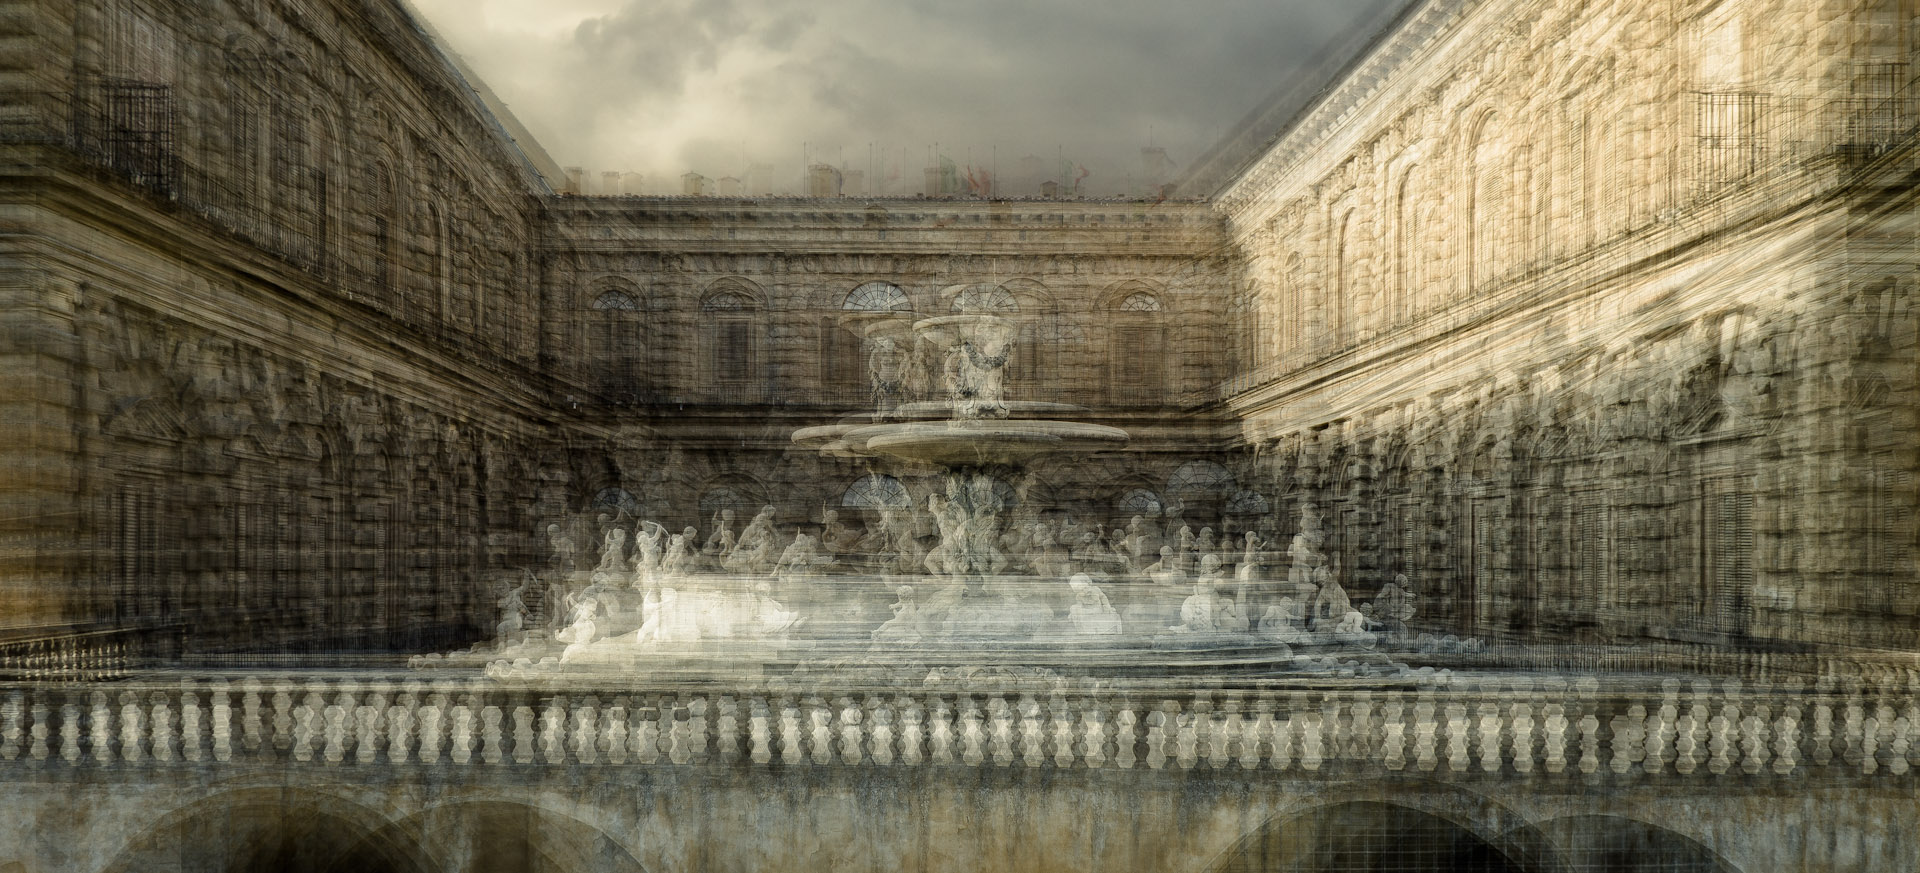 Firenze series-Riccardo magherini